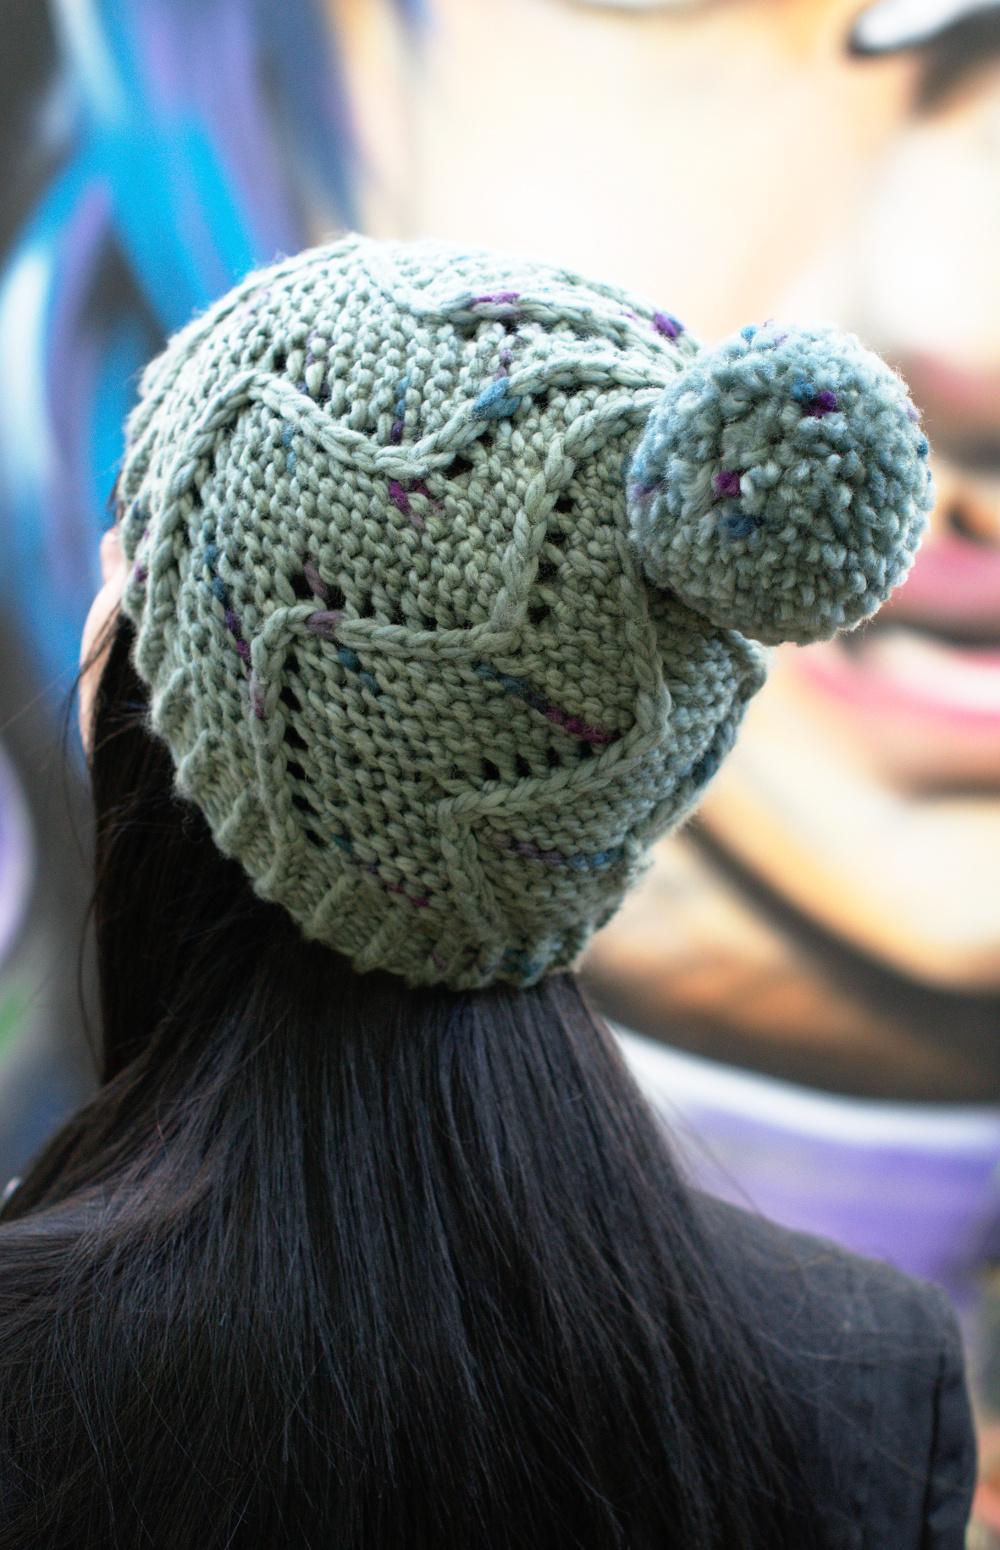 Cirro chunky spiral bobble Hat knitting pattern for Craftsy Cloudborn Fibers yarn